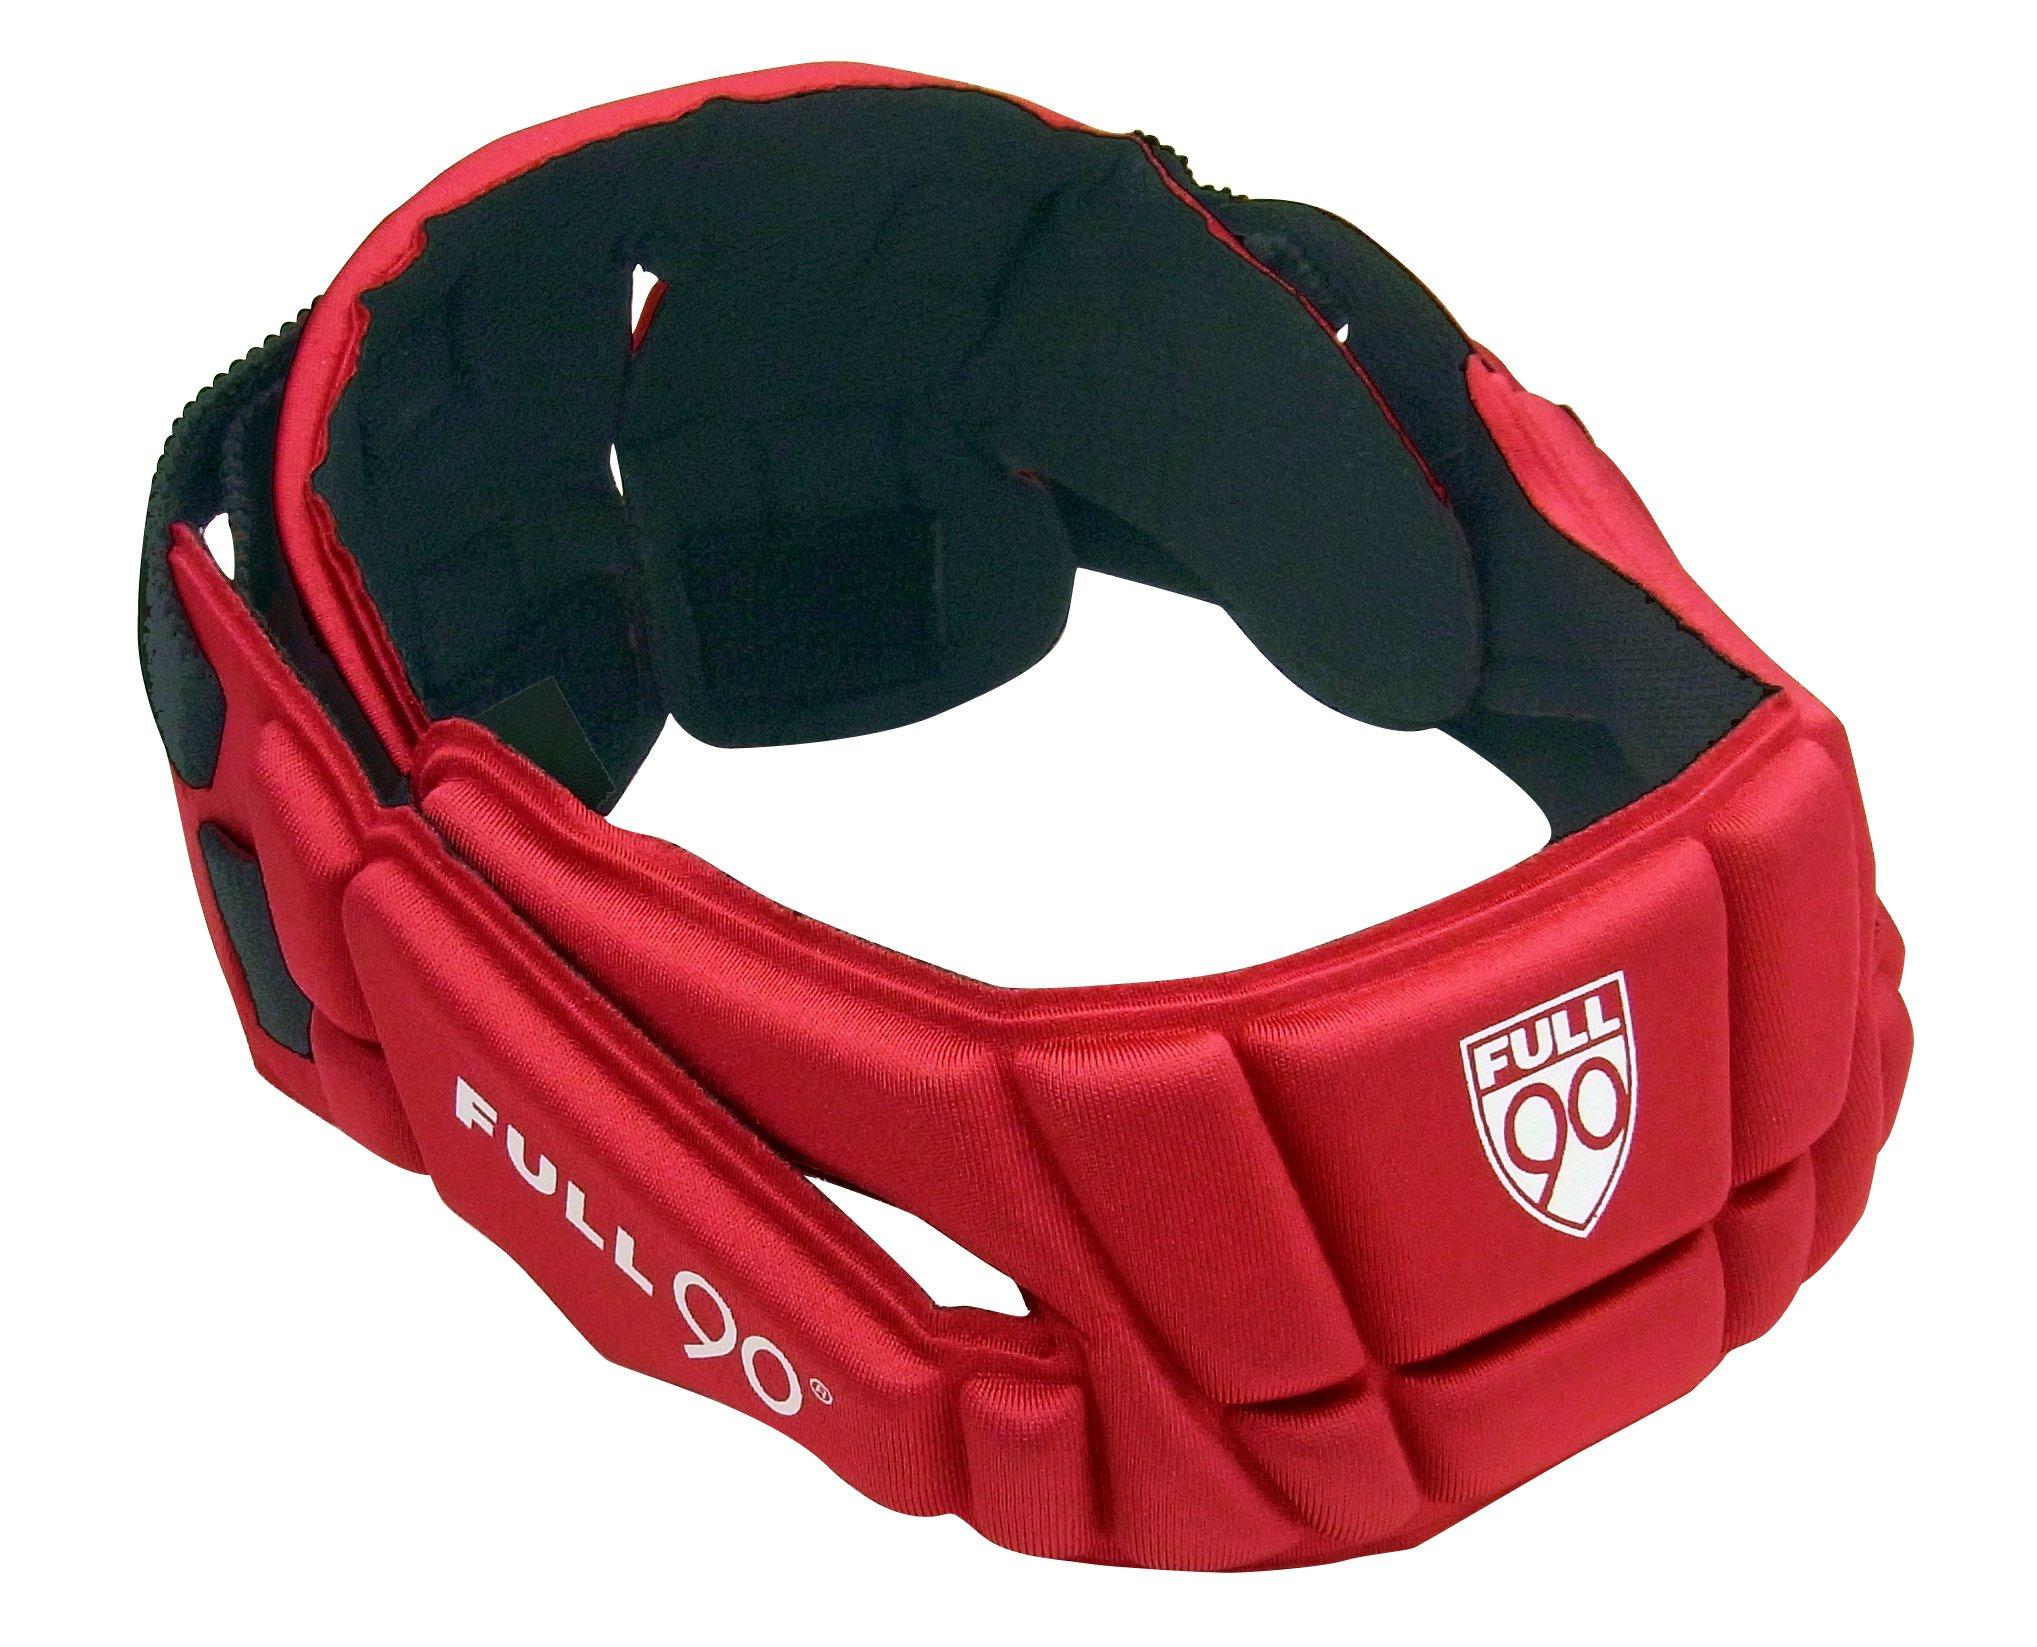 Full 90 Sports PREMIER Performance Soccer Headgear, Red, Small/Medium